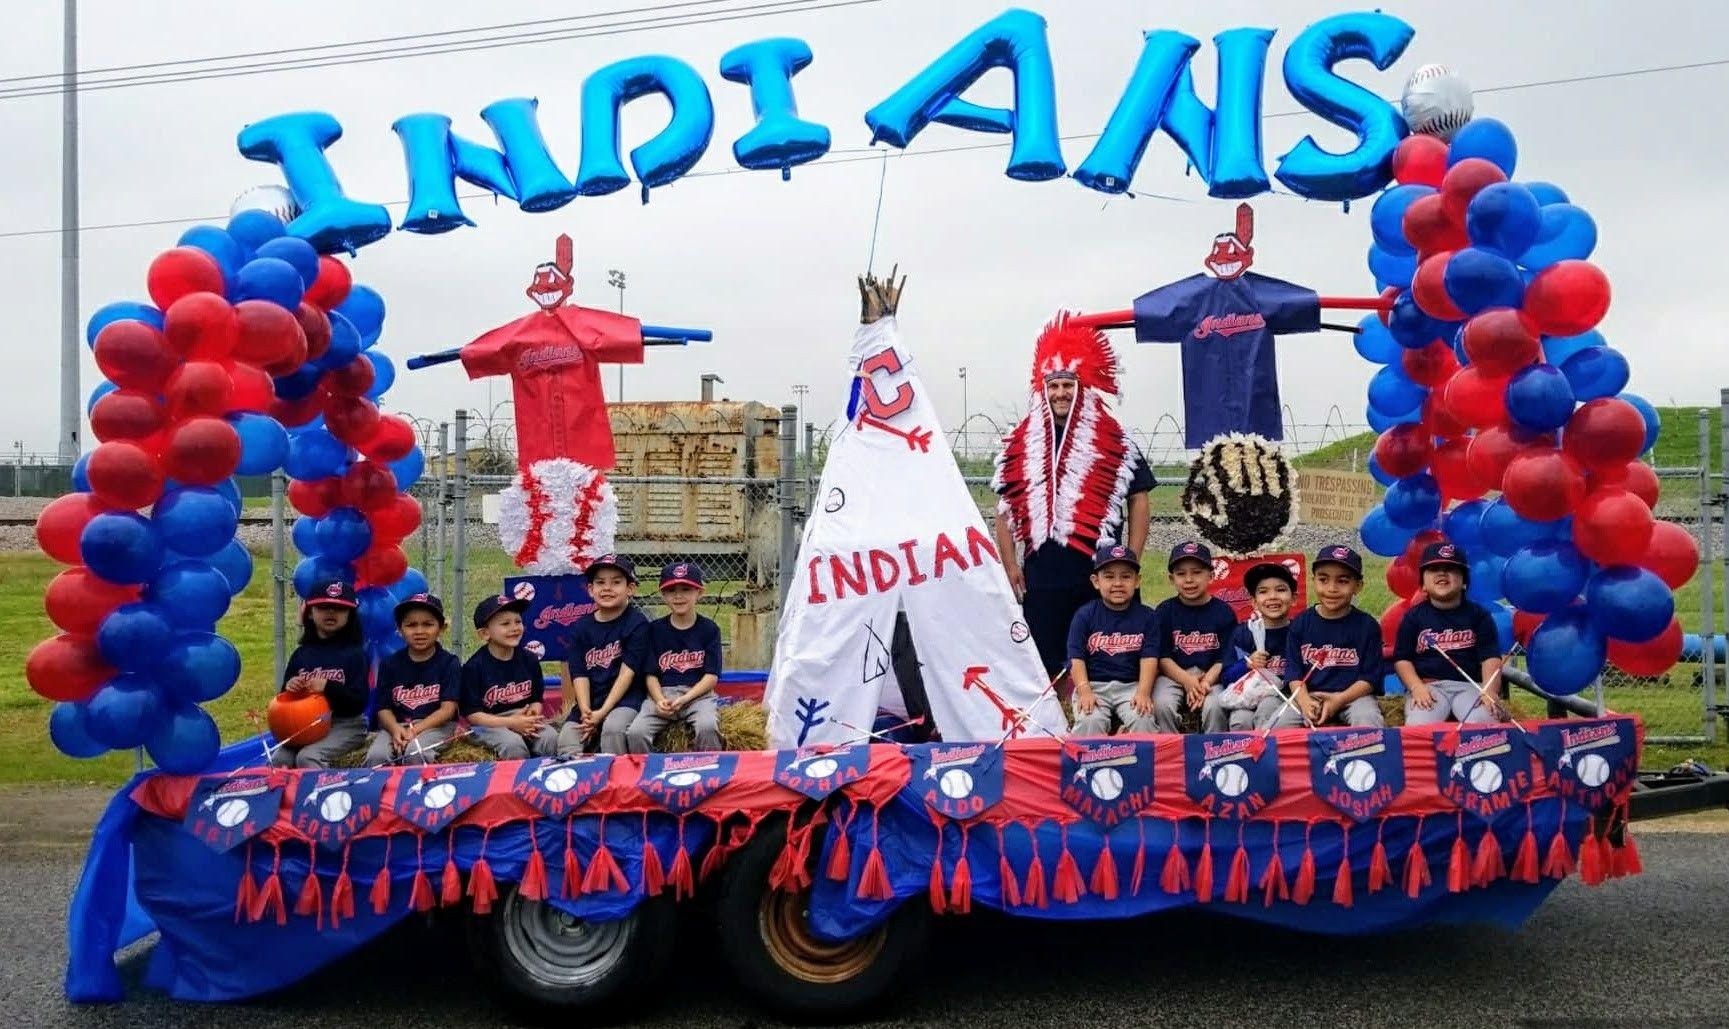 Indians Baseball Parade Float Parade Float Decorations Parade Float